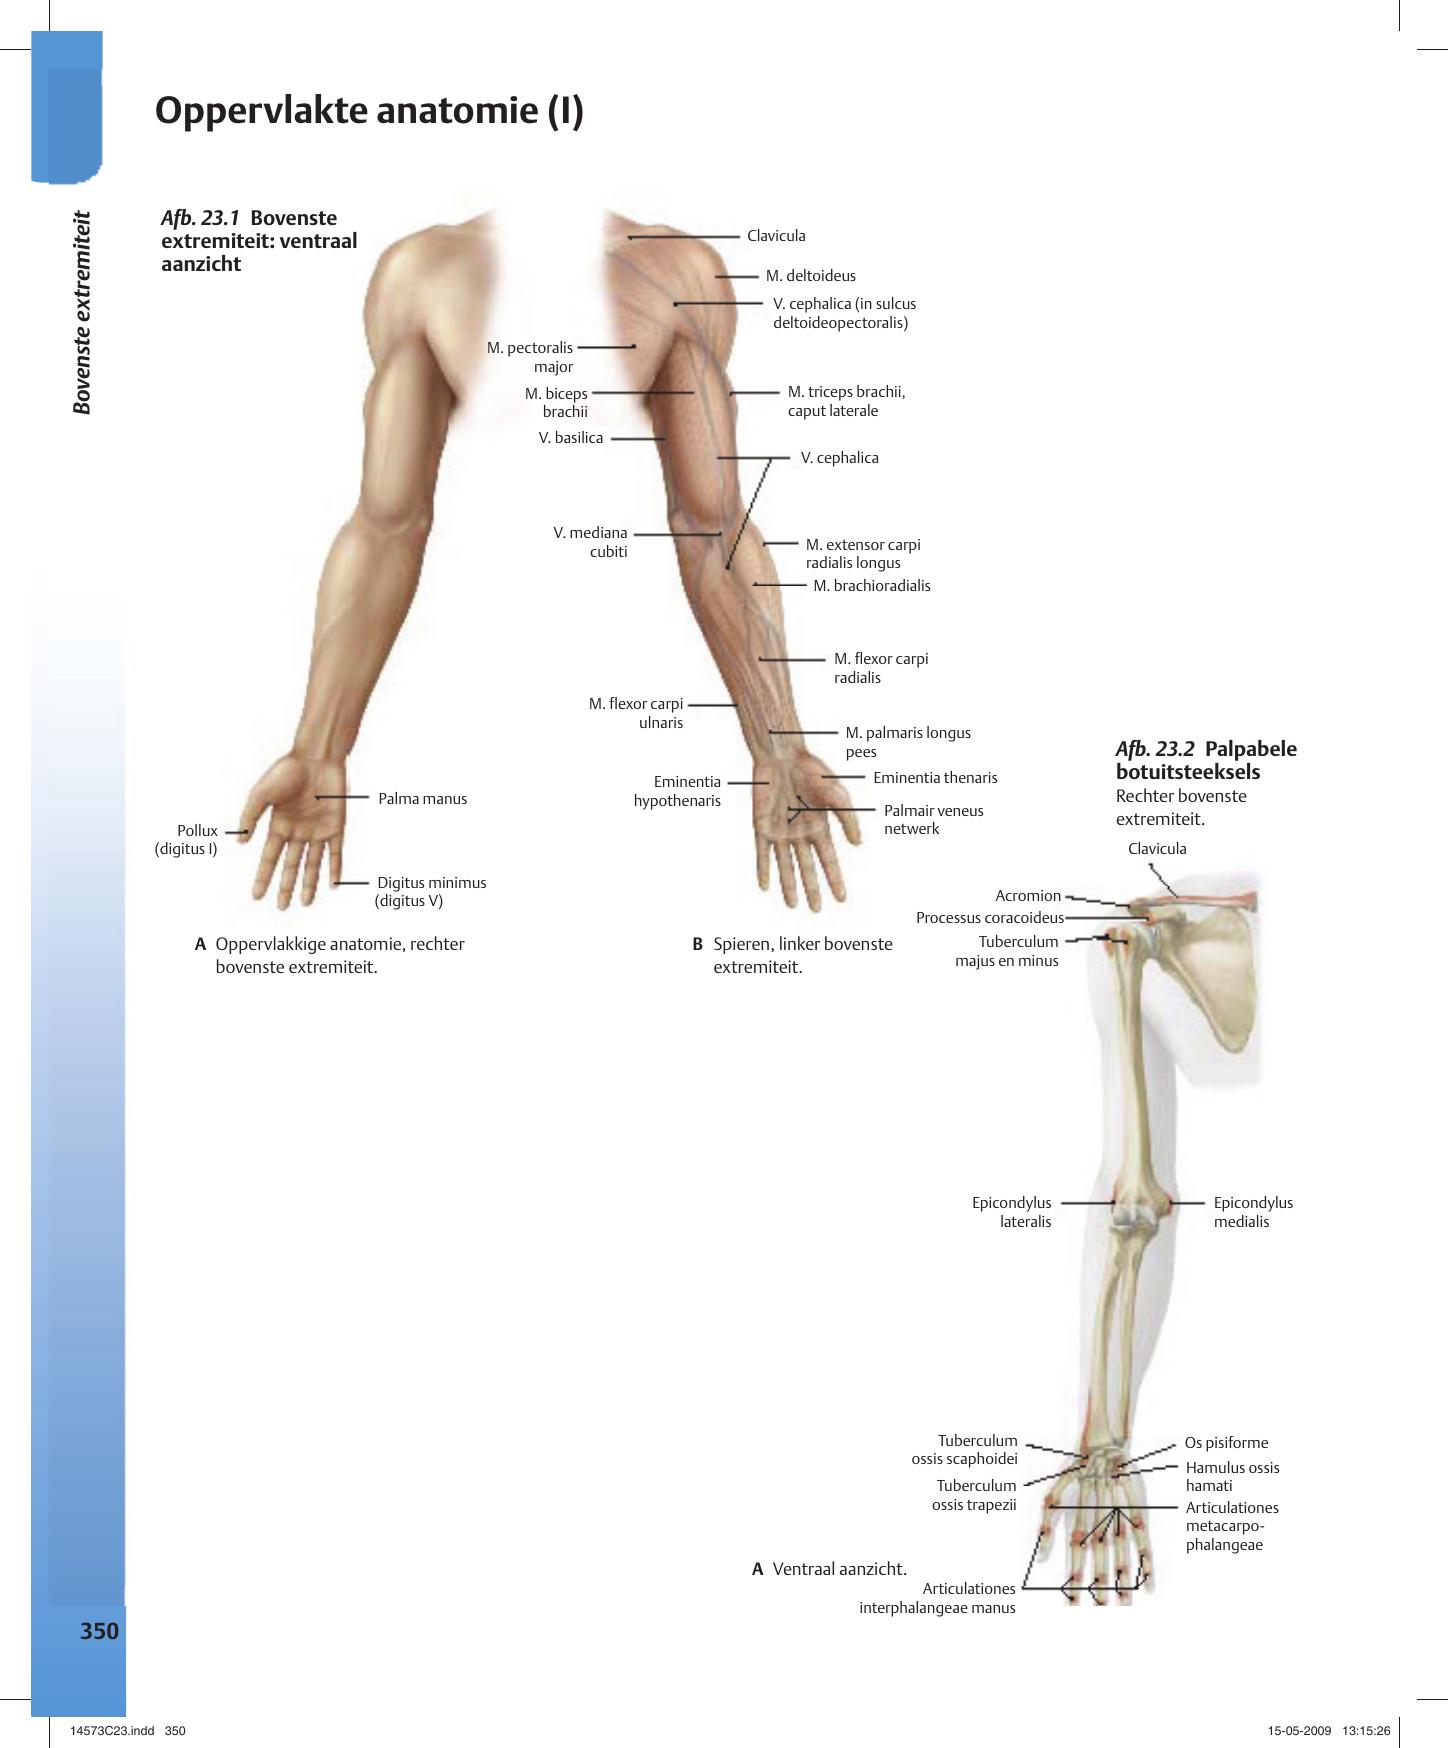 Großartig Lungenatemweg Anatomie Fotos - Anatomie Ideen - finotti.info